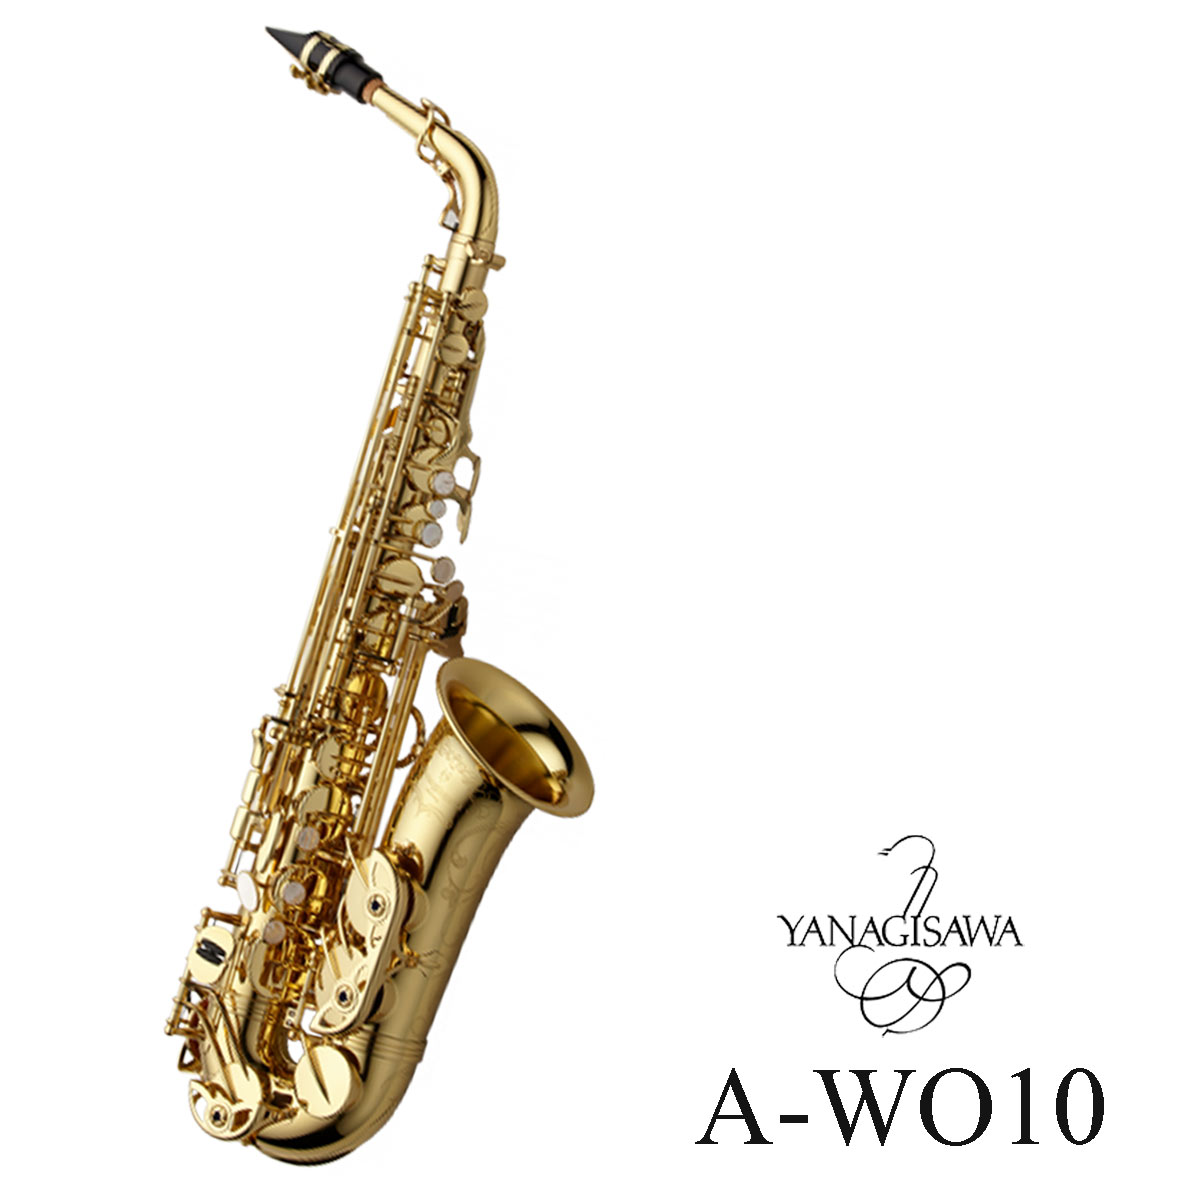 Yanagisawa / A-WO10 ヤナギサワ アルトサックス ダブルオーシリーズイエローブラス ラッカー仕上 《出荷前調整付き》【5年保証】